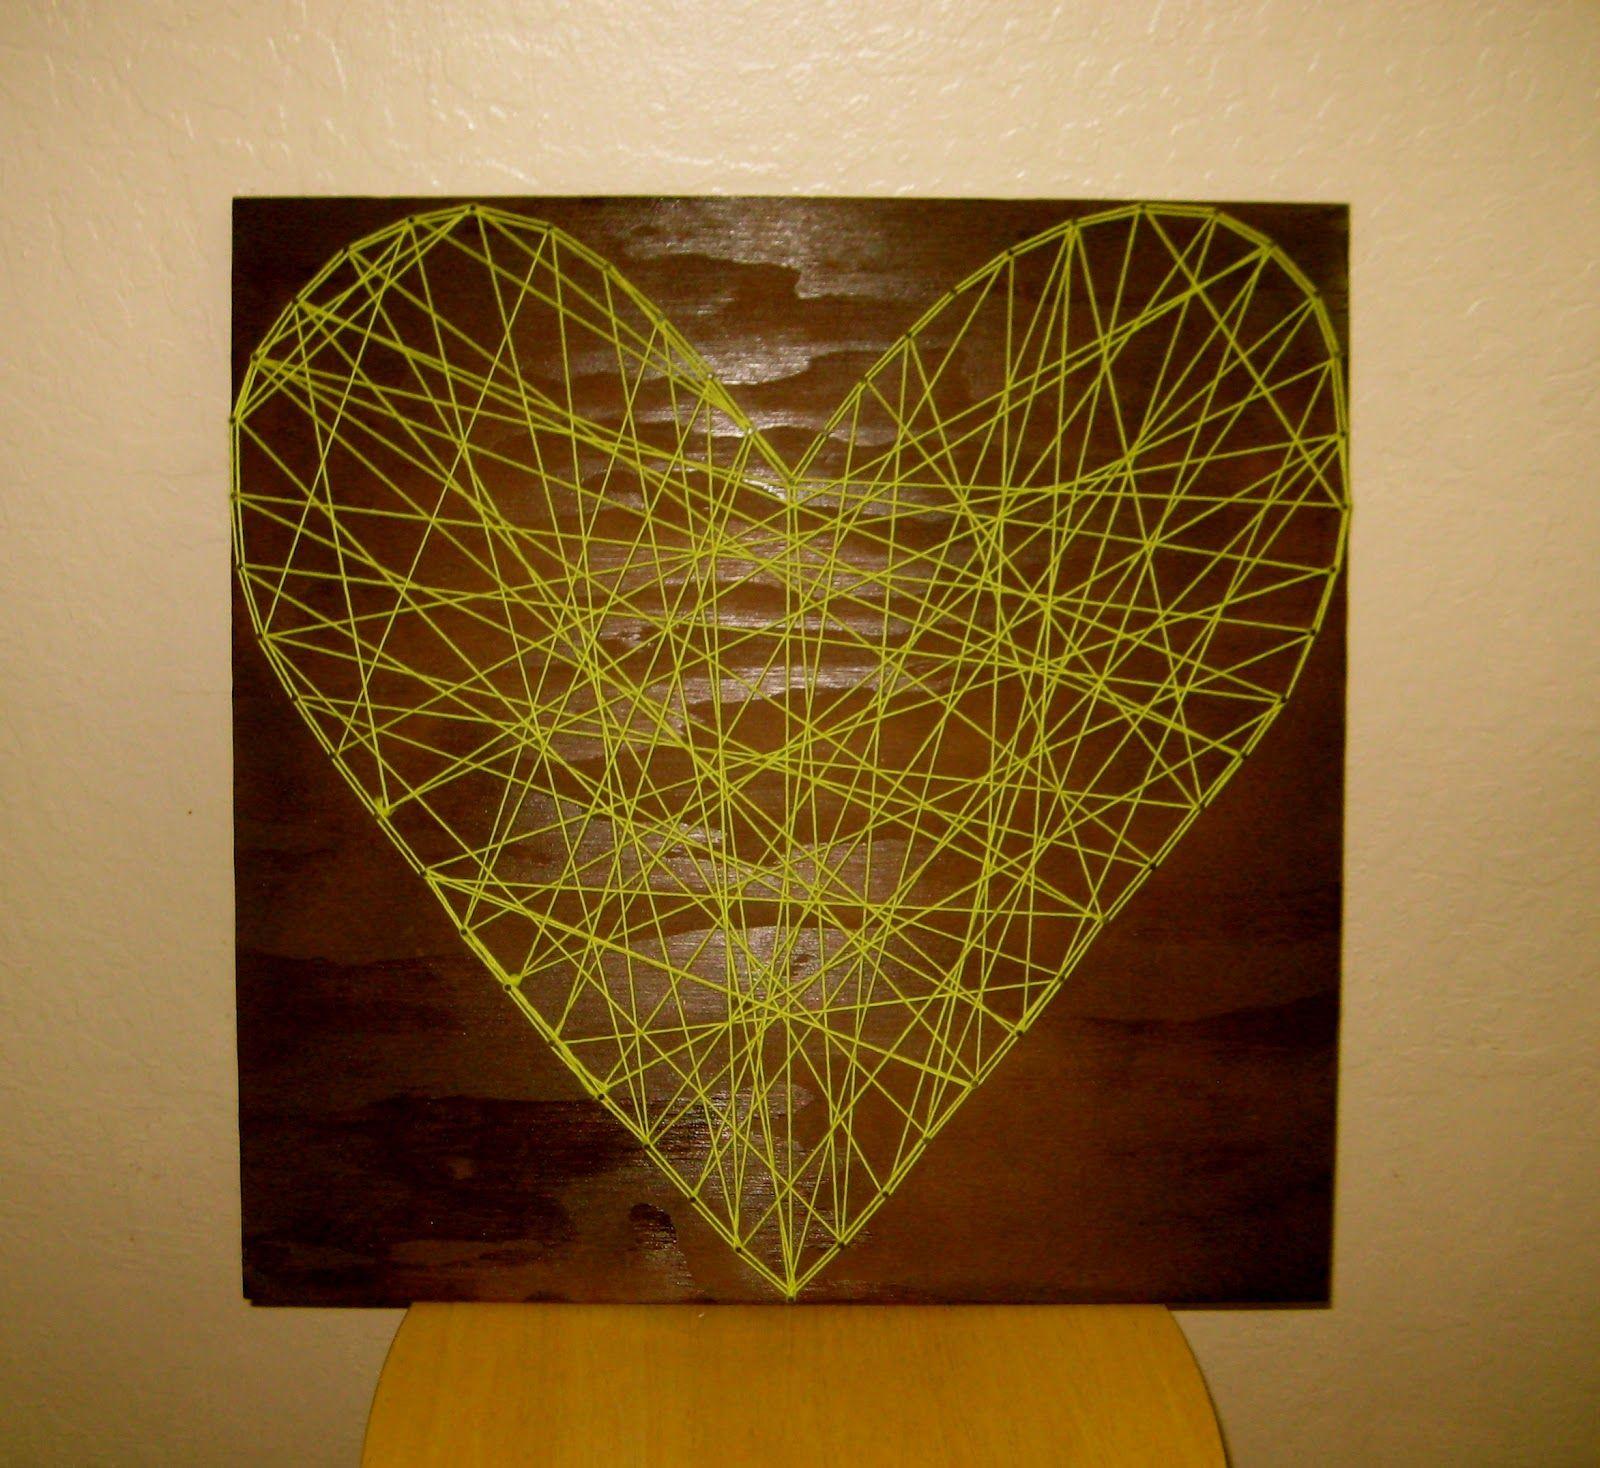 prettyLOVE, prettyLIFE: prettyLITTLE string-art | String art ...